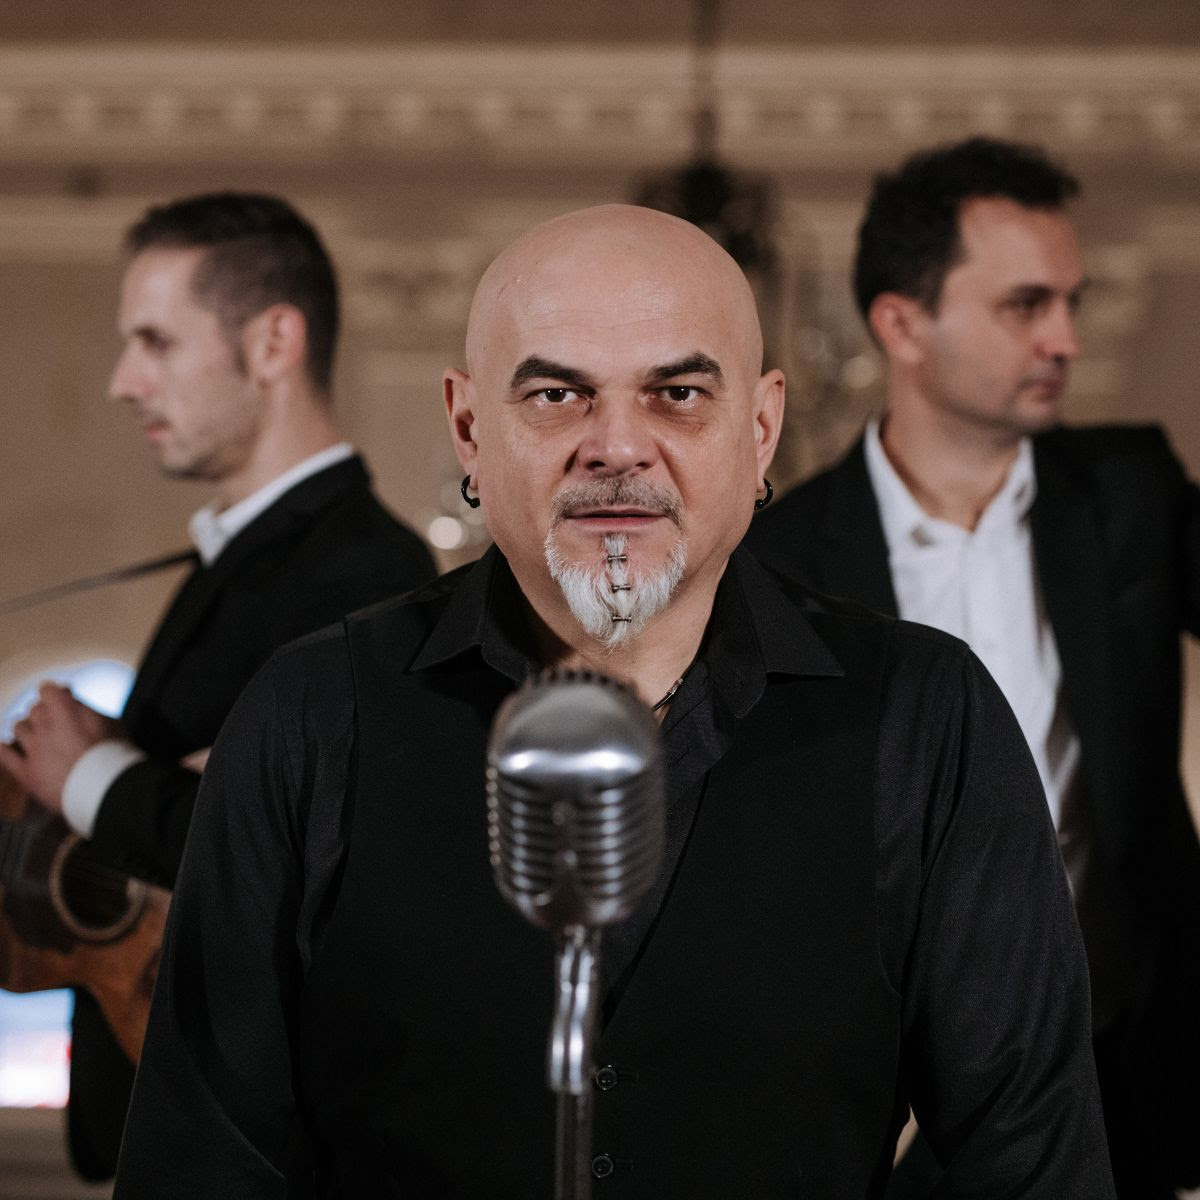 Foto: TOMISLAV ŠILOVINAC